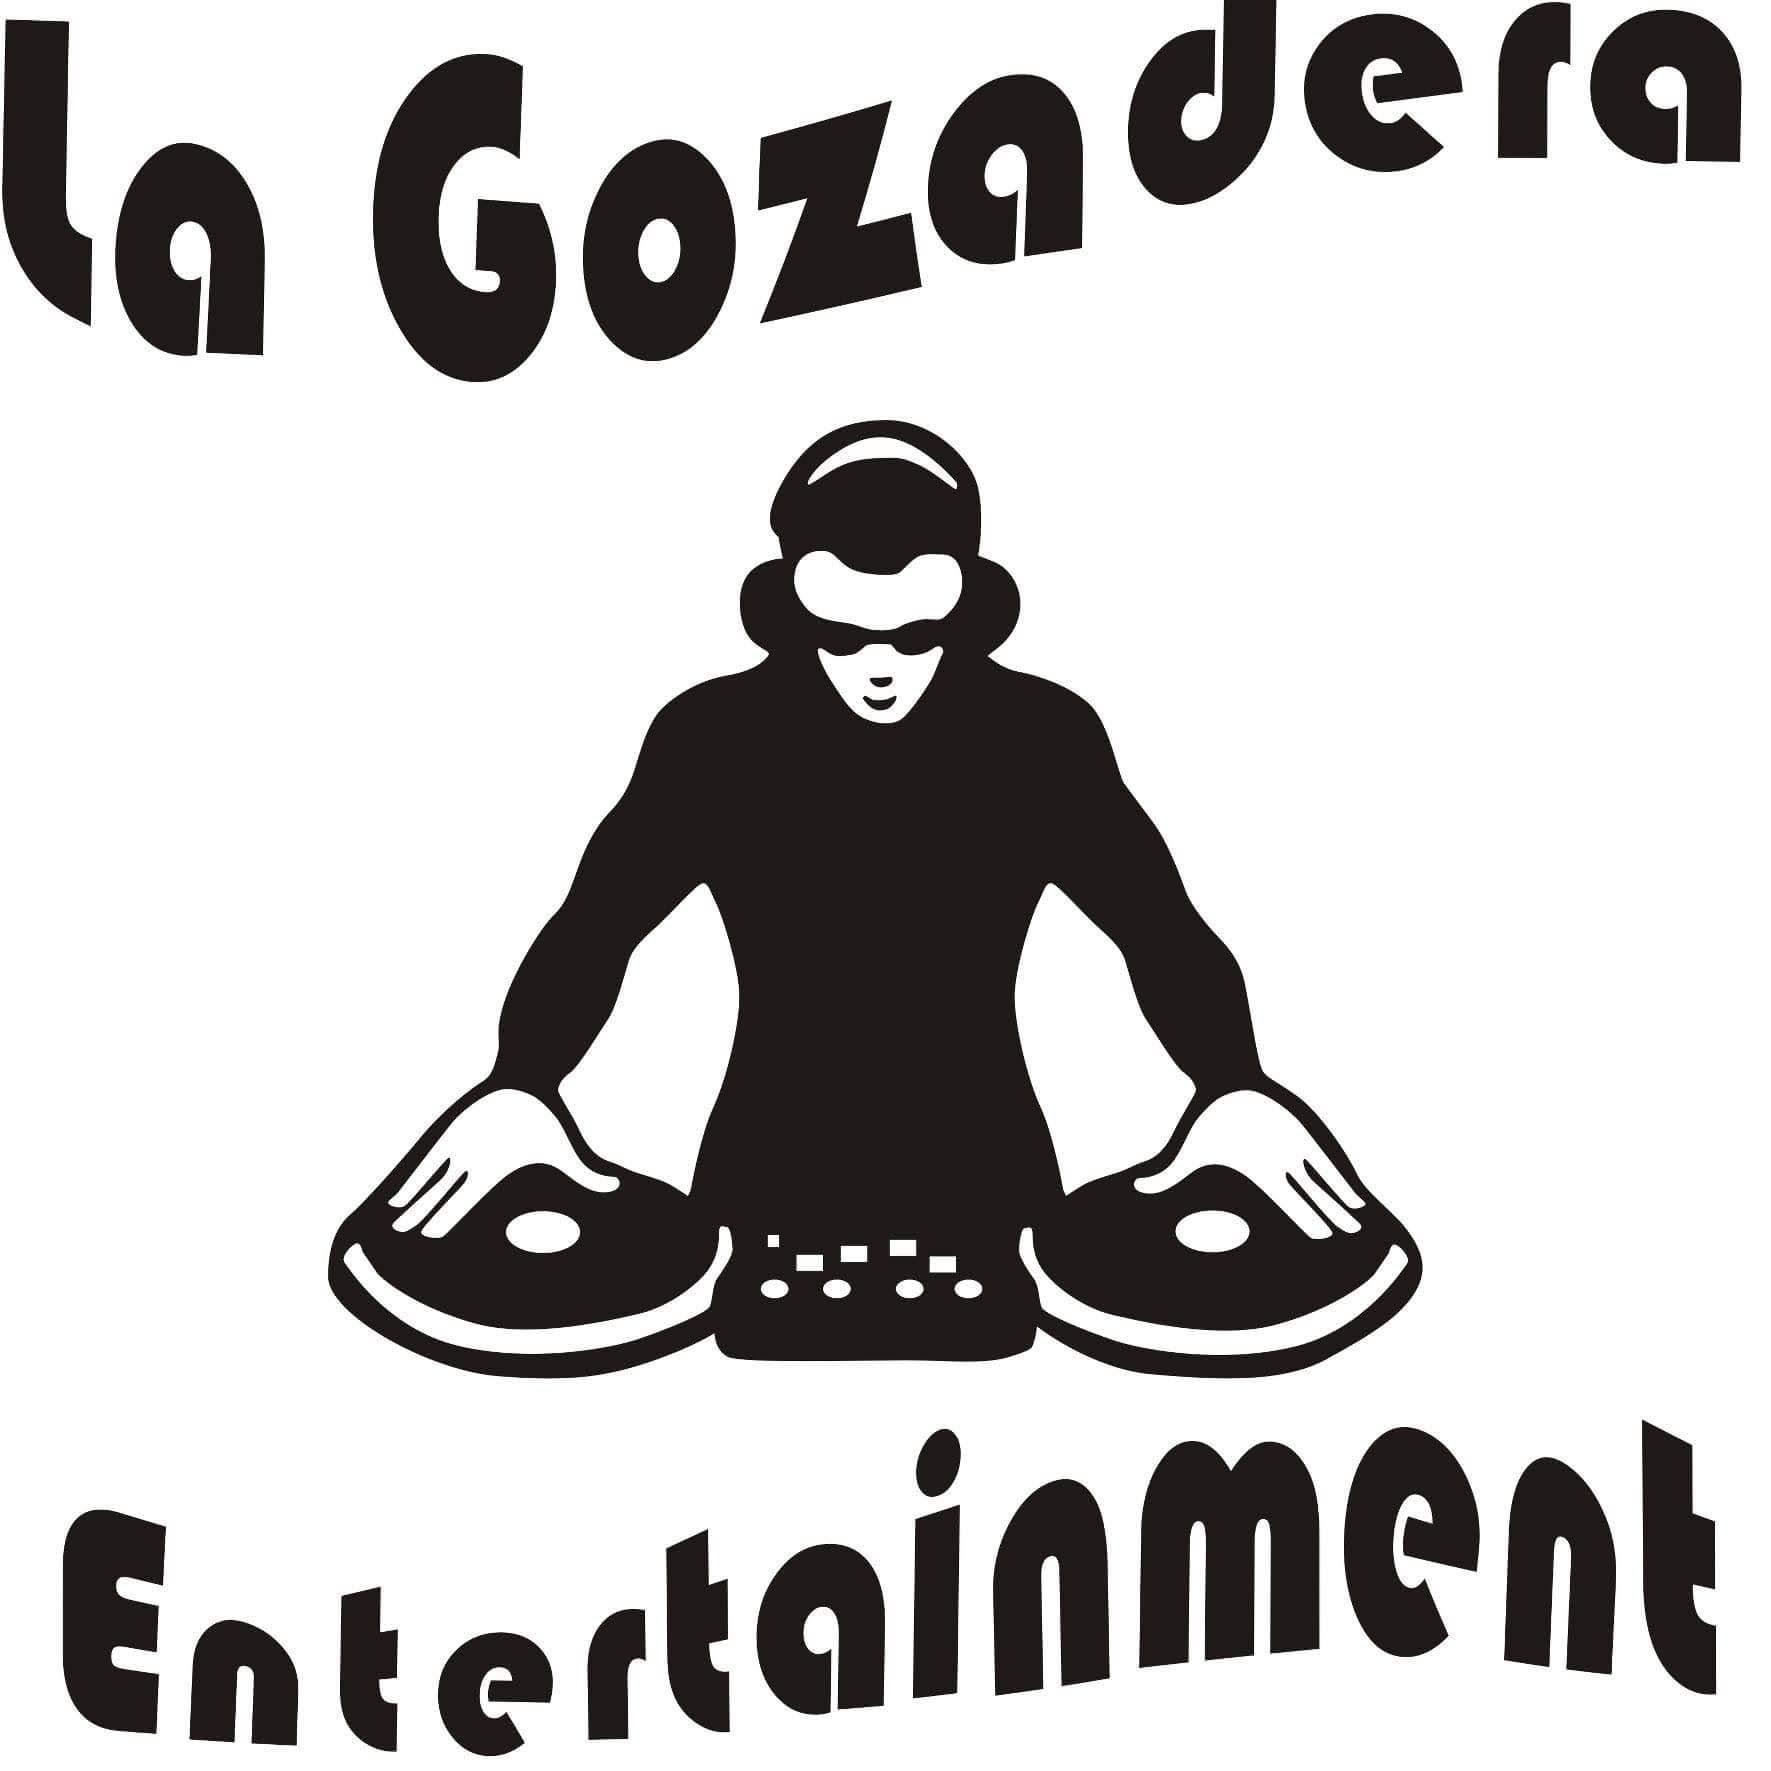 LaGozadera